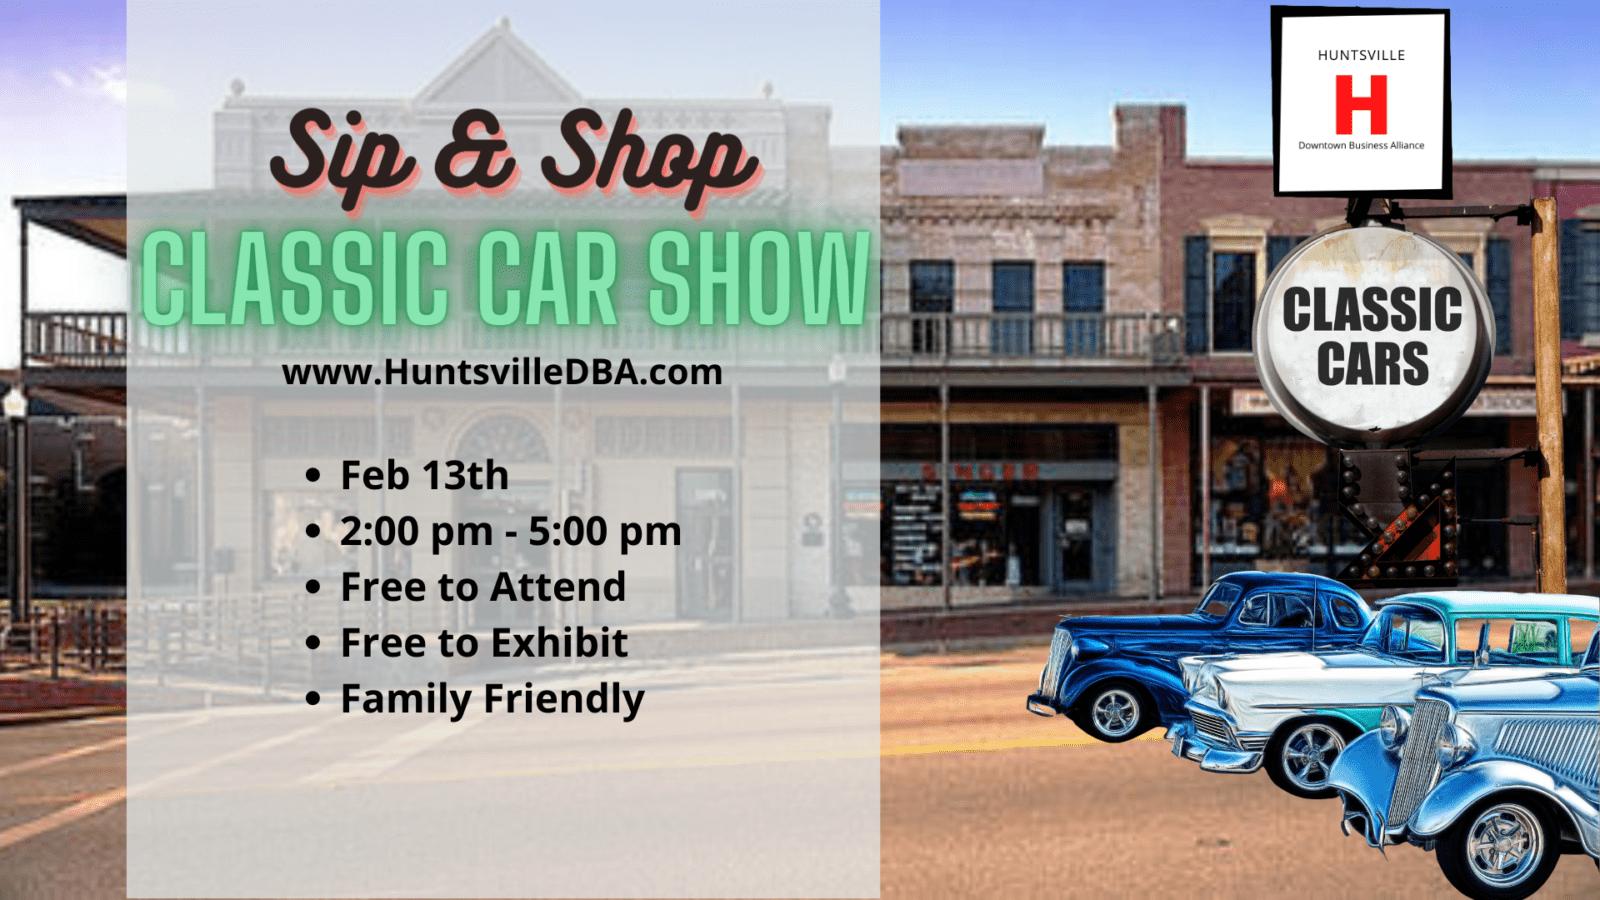 Huntsville Classic Car Show